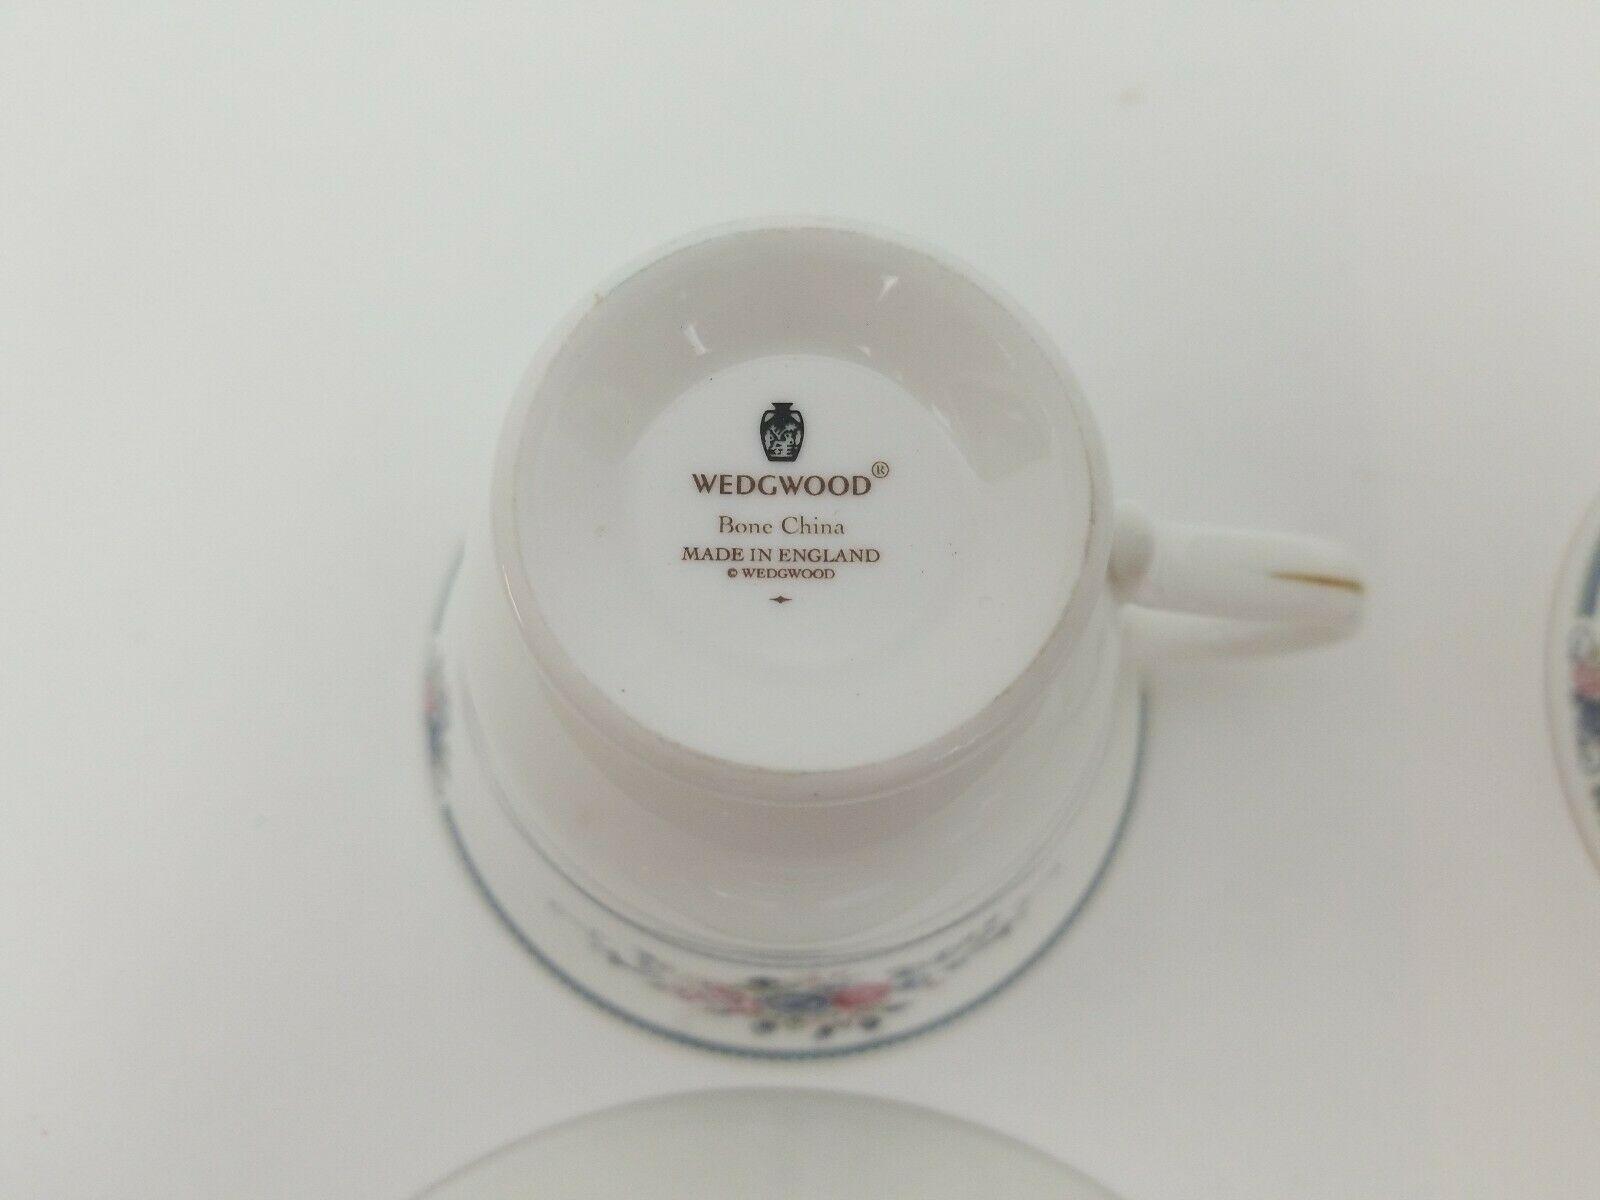 Wedgwood Bone China Cup & Saucer Set of 2 Charlotte White Gold Trim England 1991 image 7